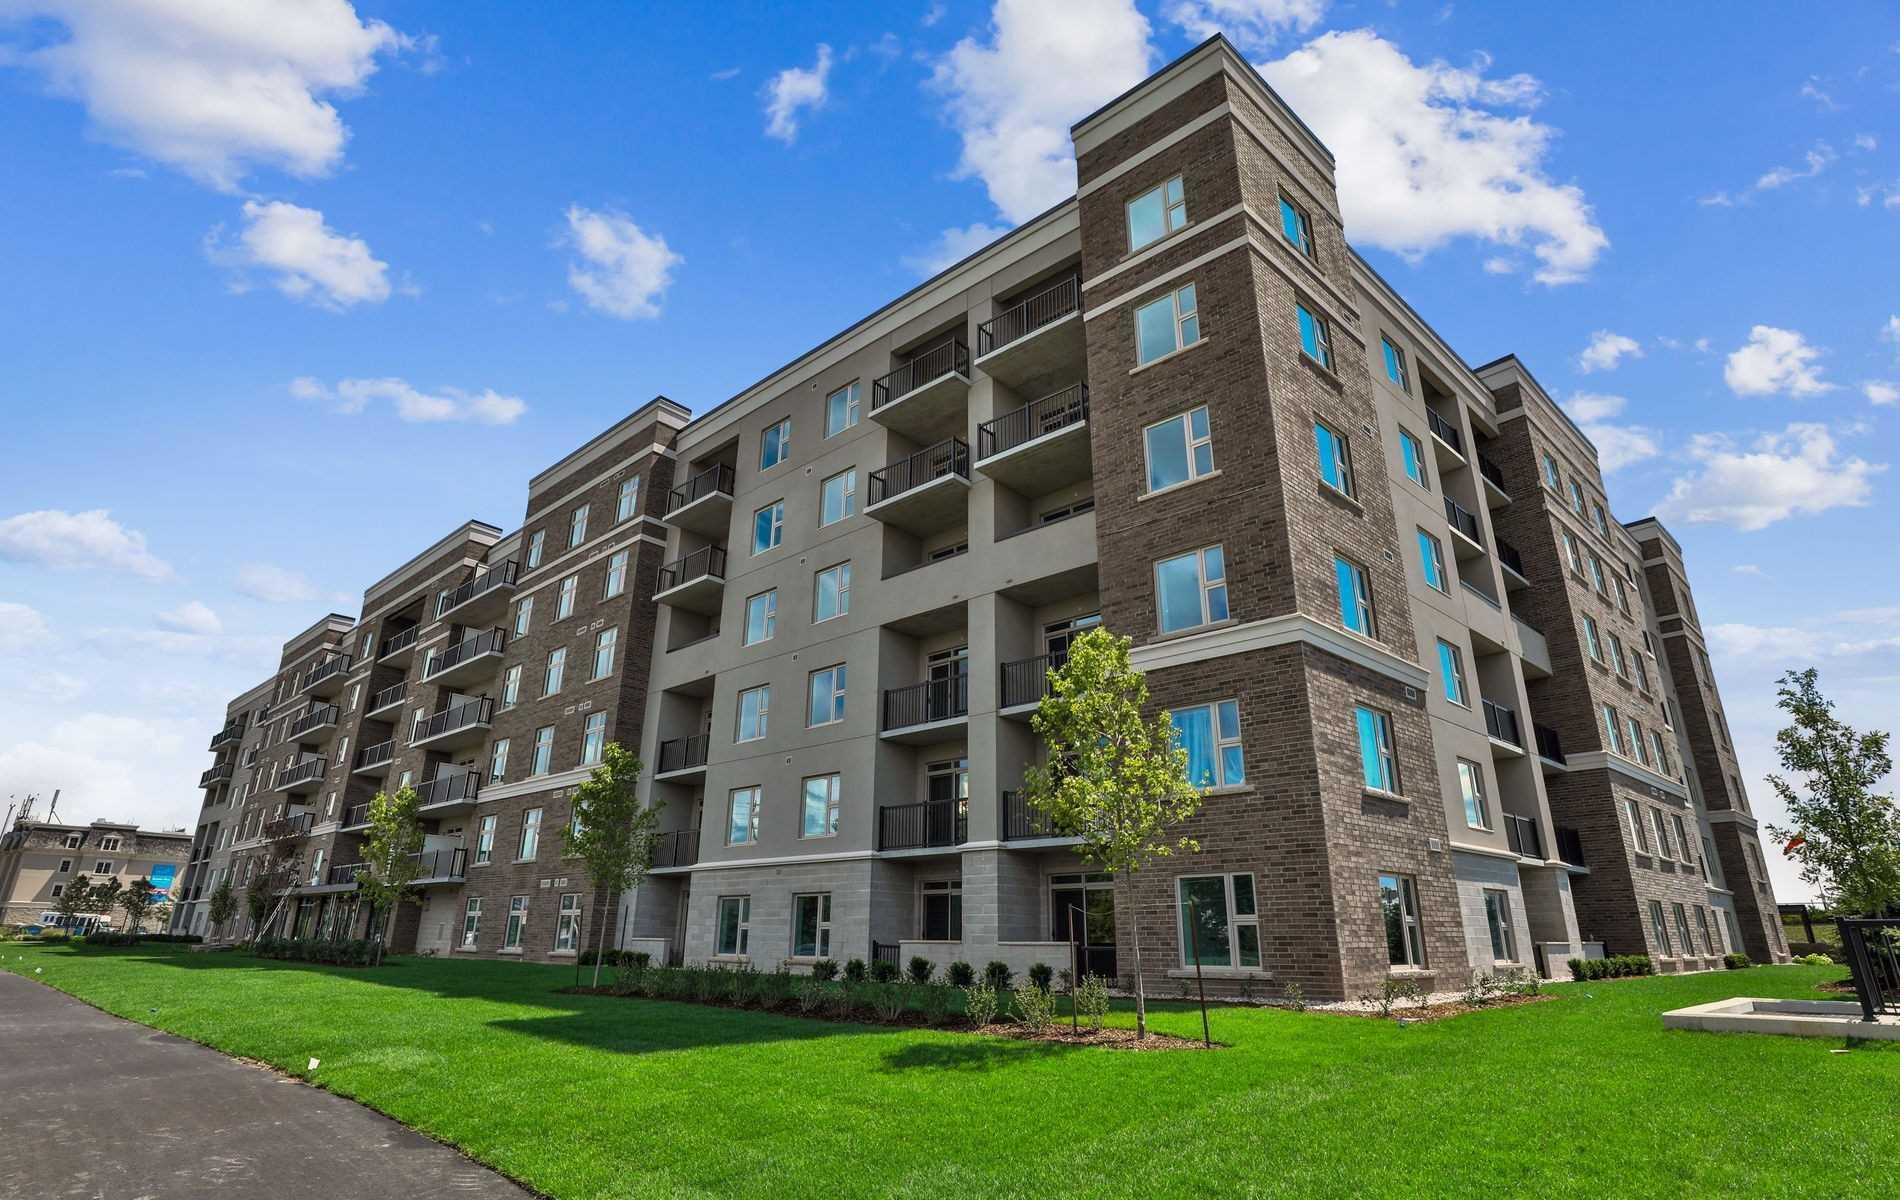 316 - 610 Farmstead Dr - Willmont Condo Apt for sale, 2 Bedrooms (W5399854) - #1